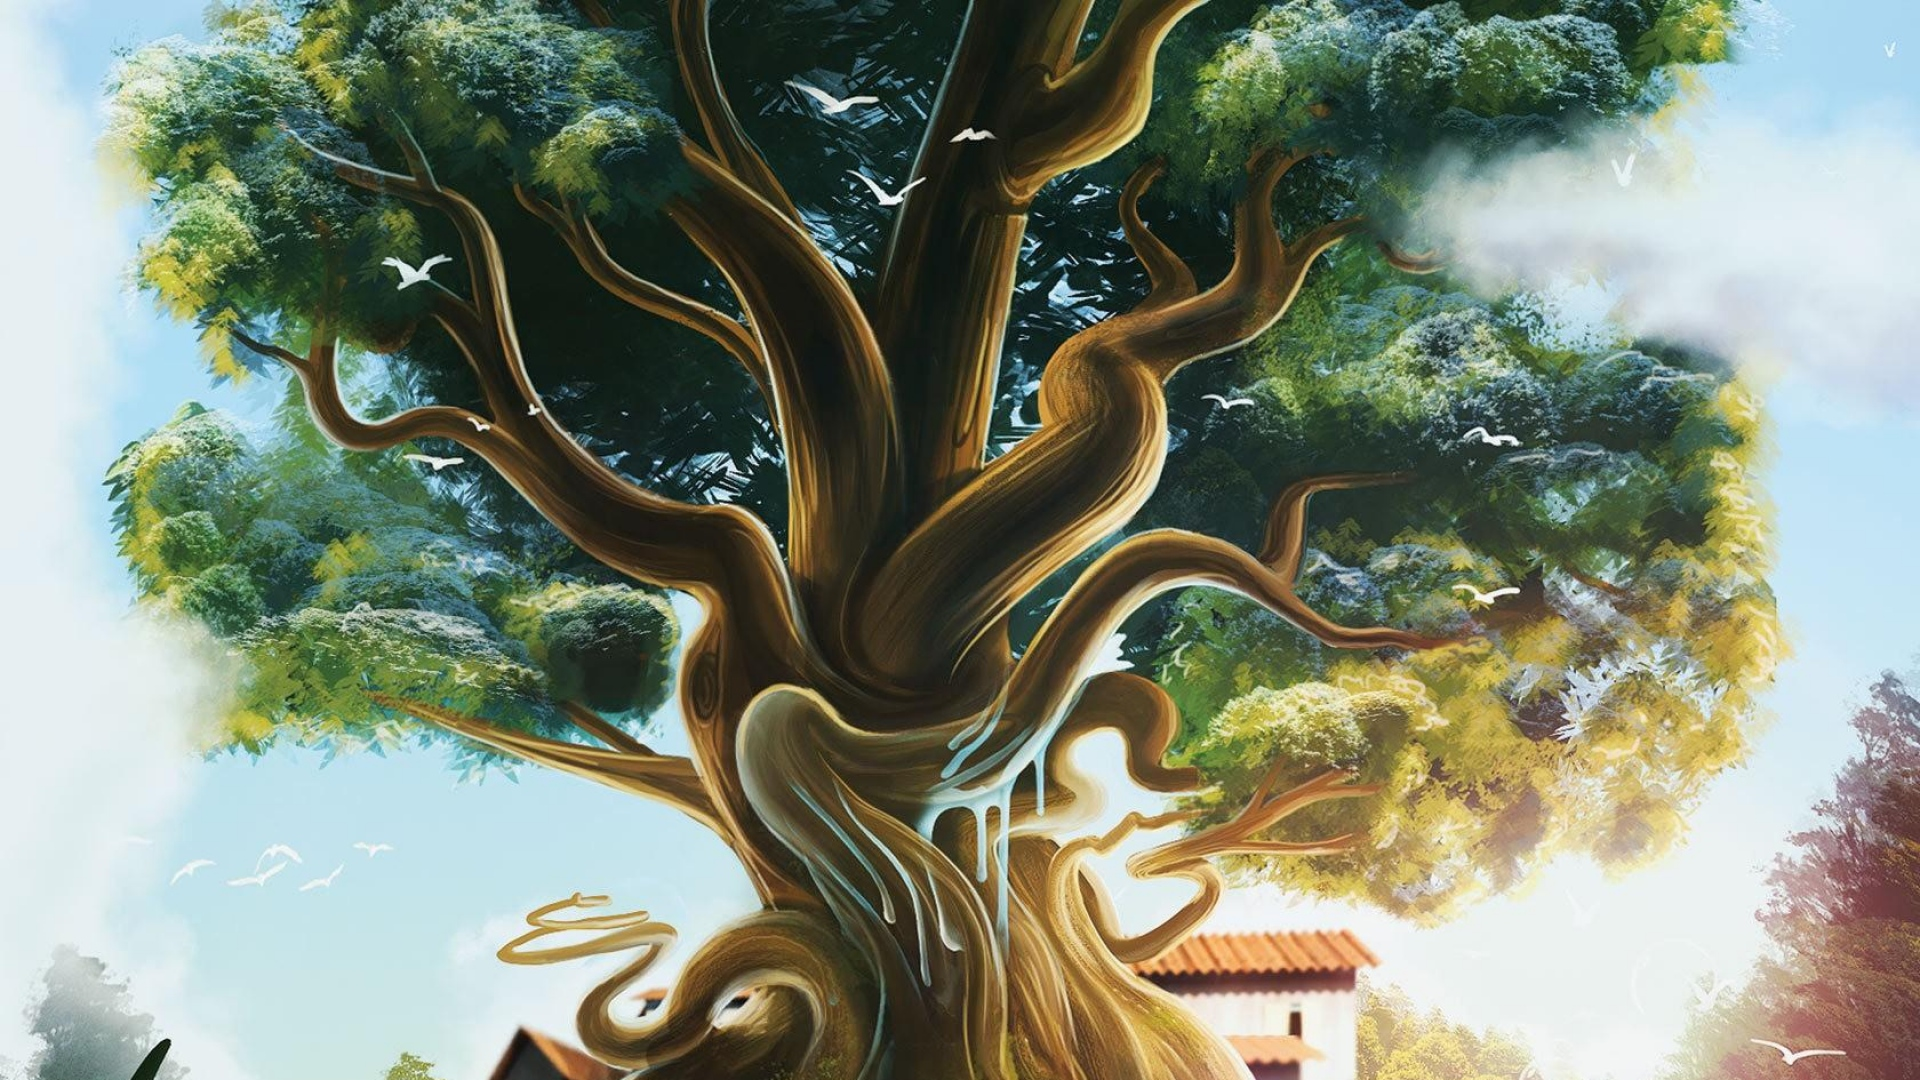 древо жизни картинка фон законное место